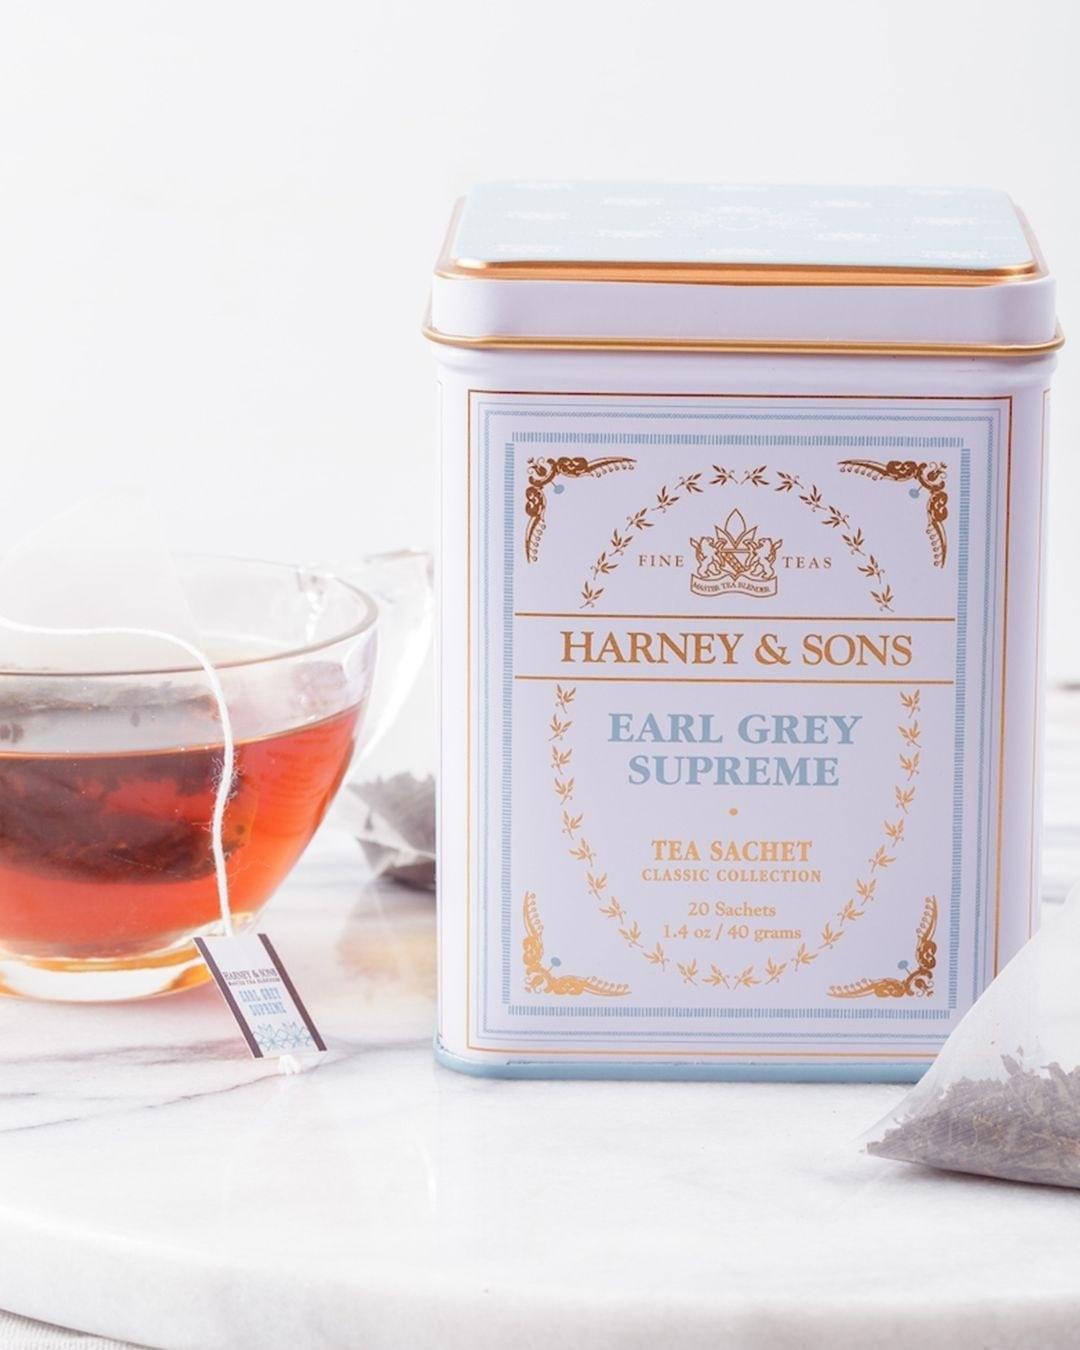 A close up of the tin of Earl Grey Supreme tea next to a glass mug